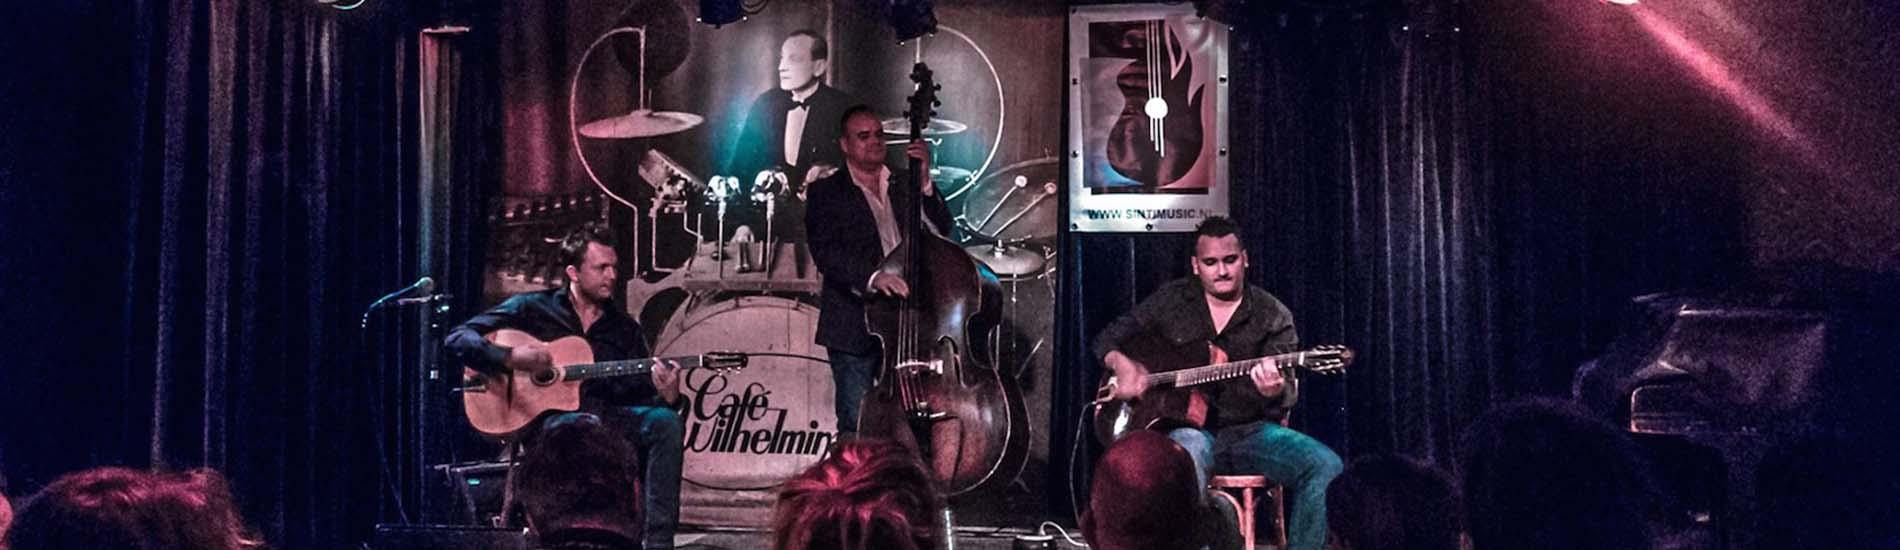 rosenberg trio gipsy muziek live op podium